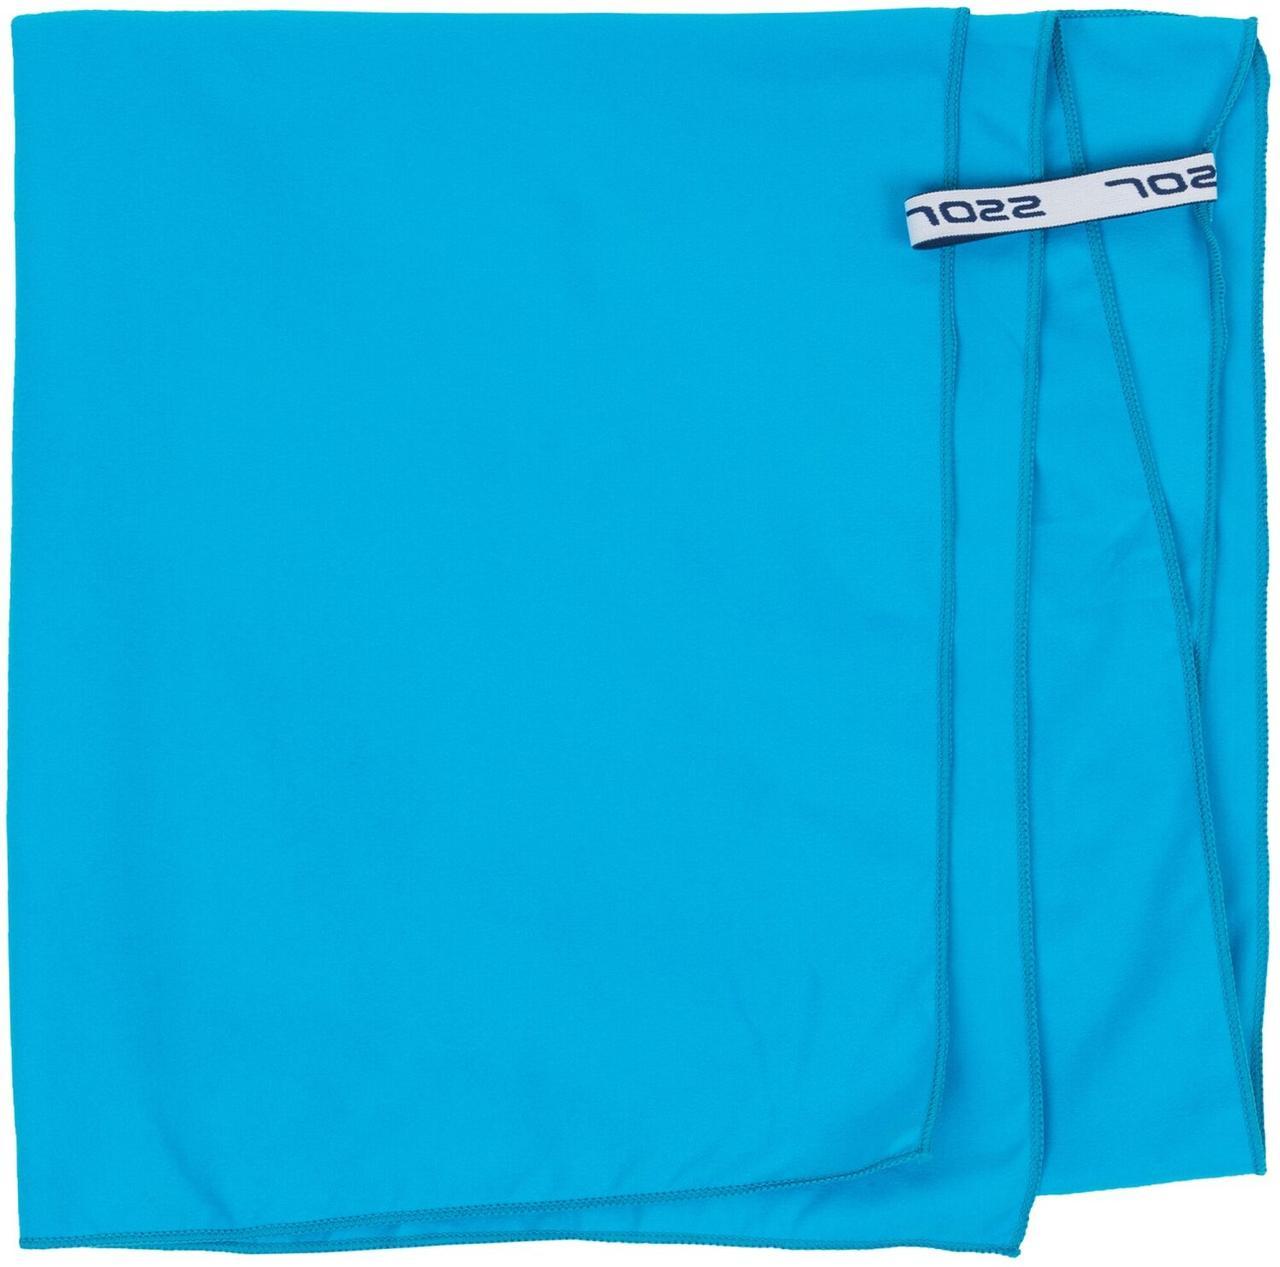 Полотенце абсорбирующее Joss Absorption Towel, ярко-голубой